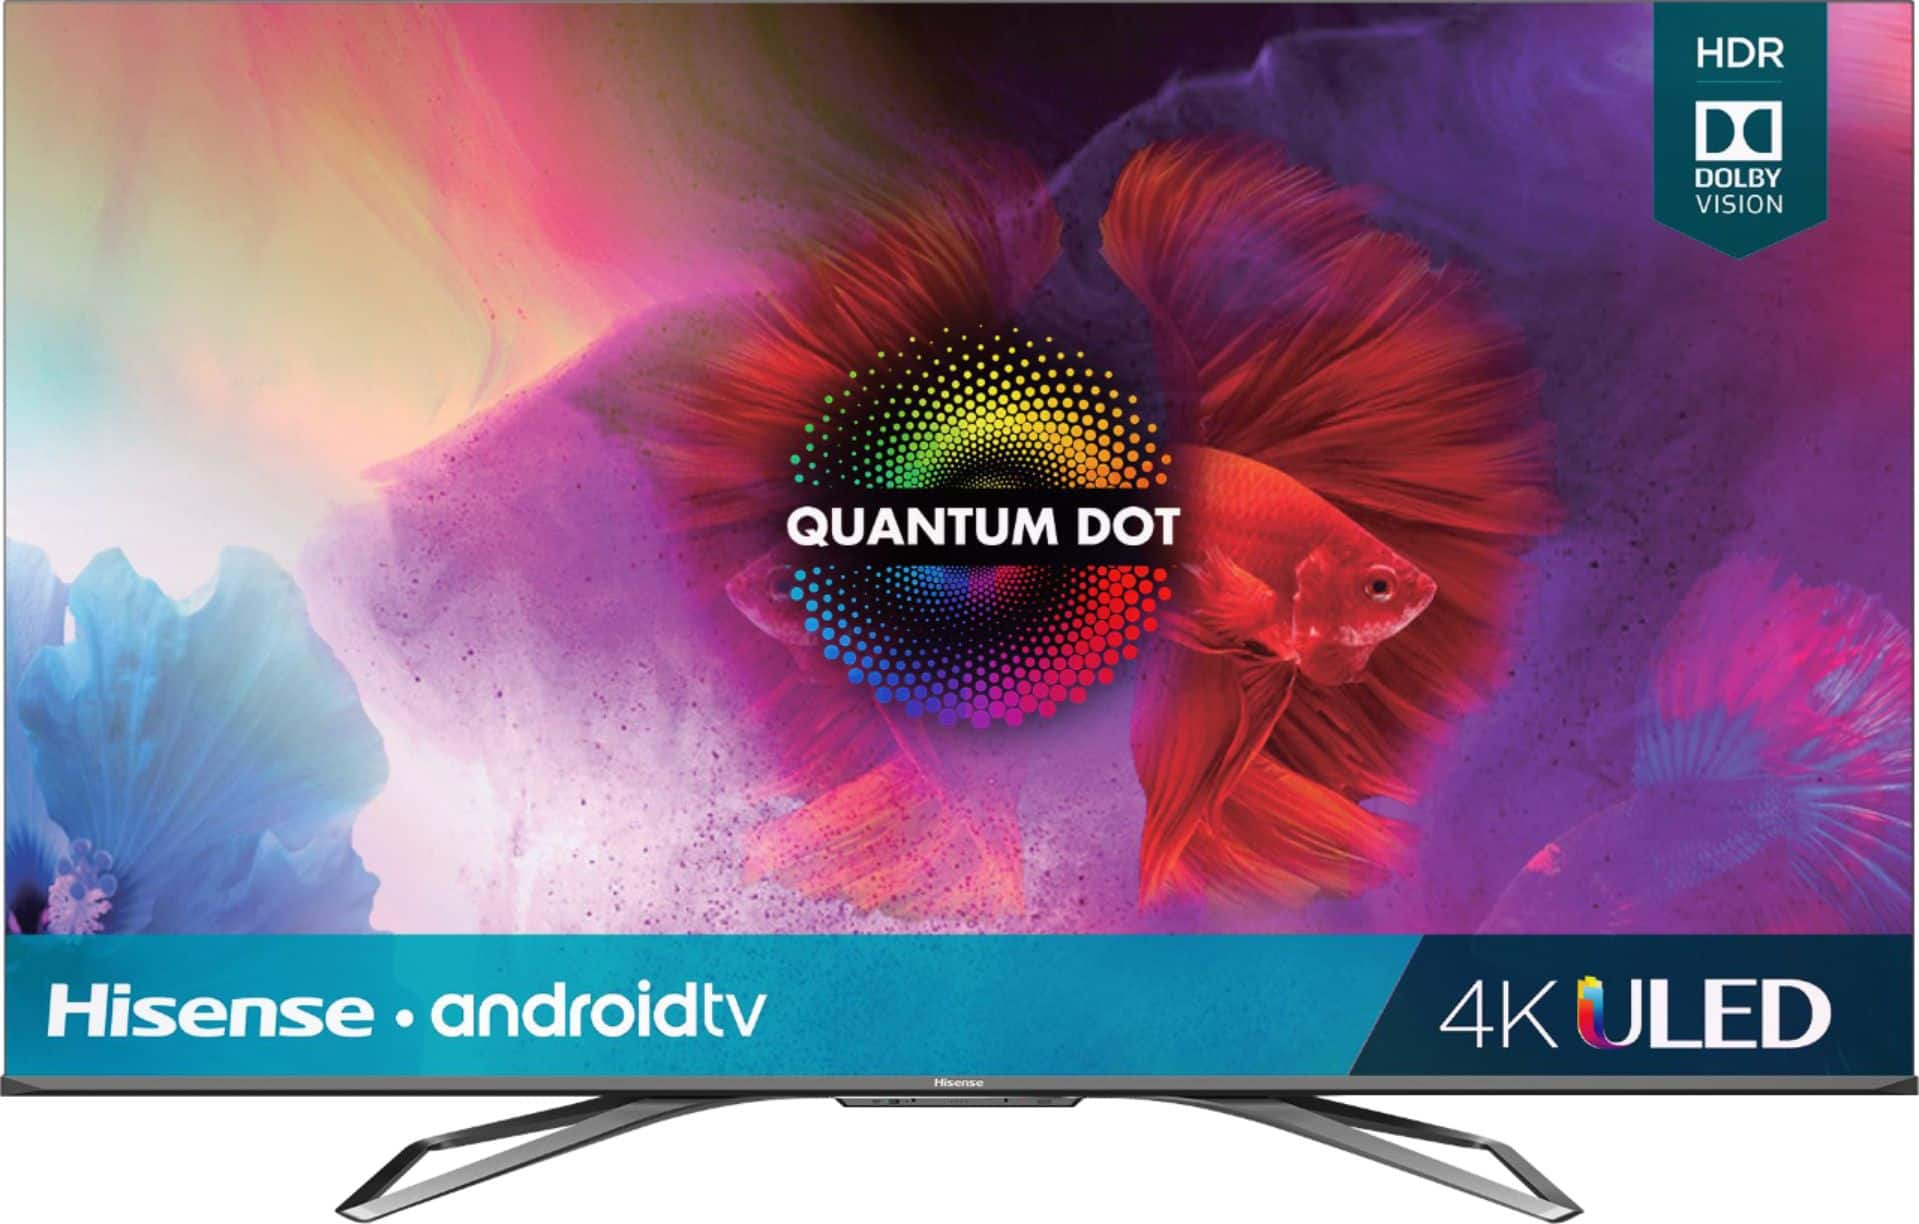 "Hisense 55"" Class H9G Quantum Series LED 4K UHD Smart Android TV 55H9G - $649.99 at Bestbuy"